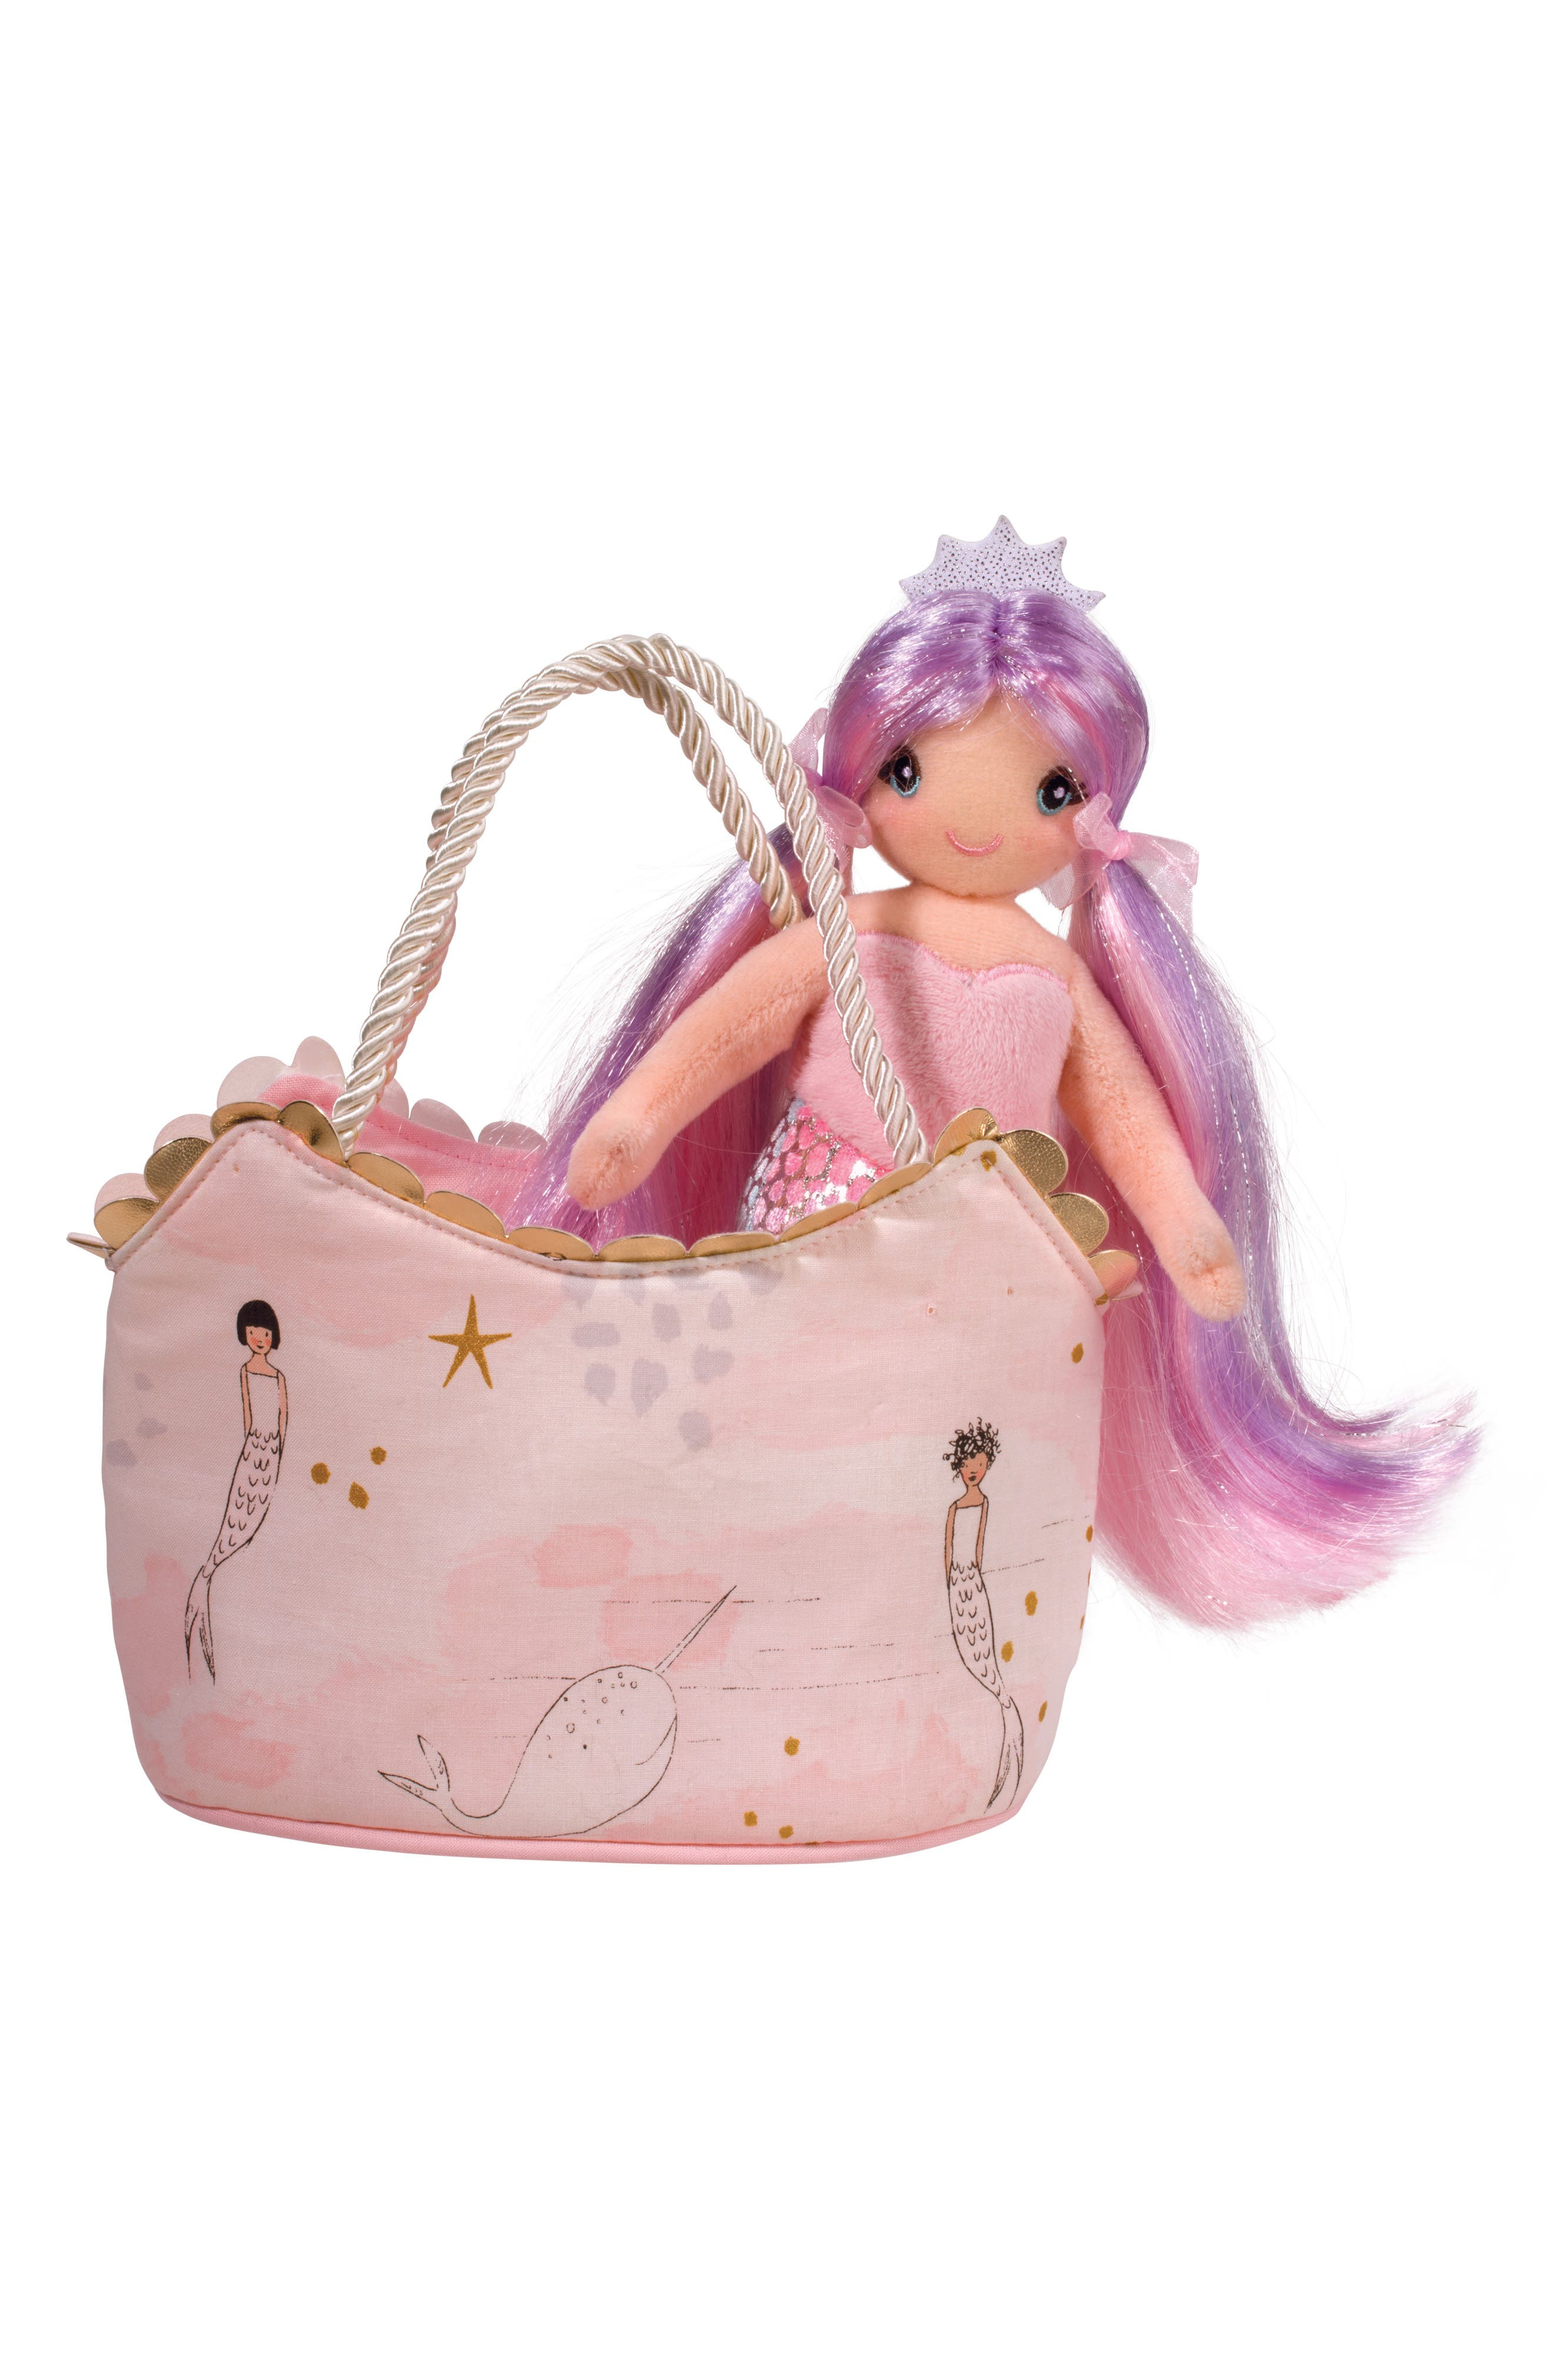 Douglas Mermaid Princess & Handbag